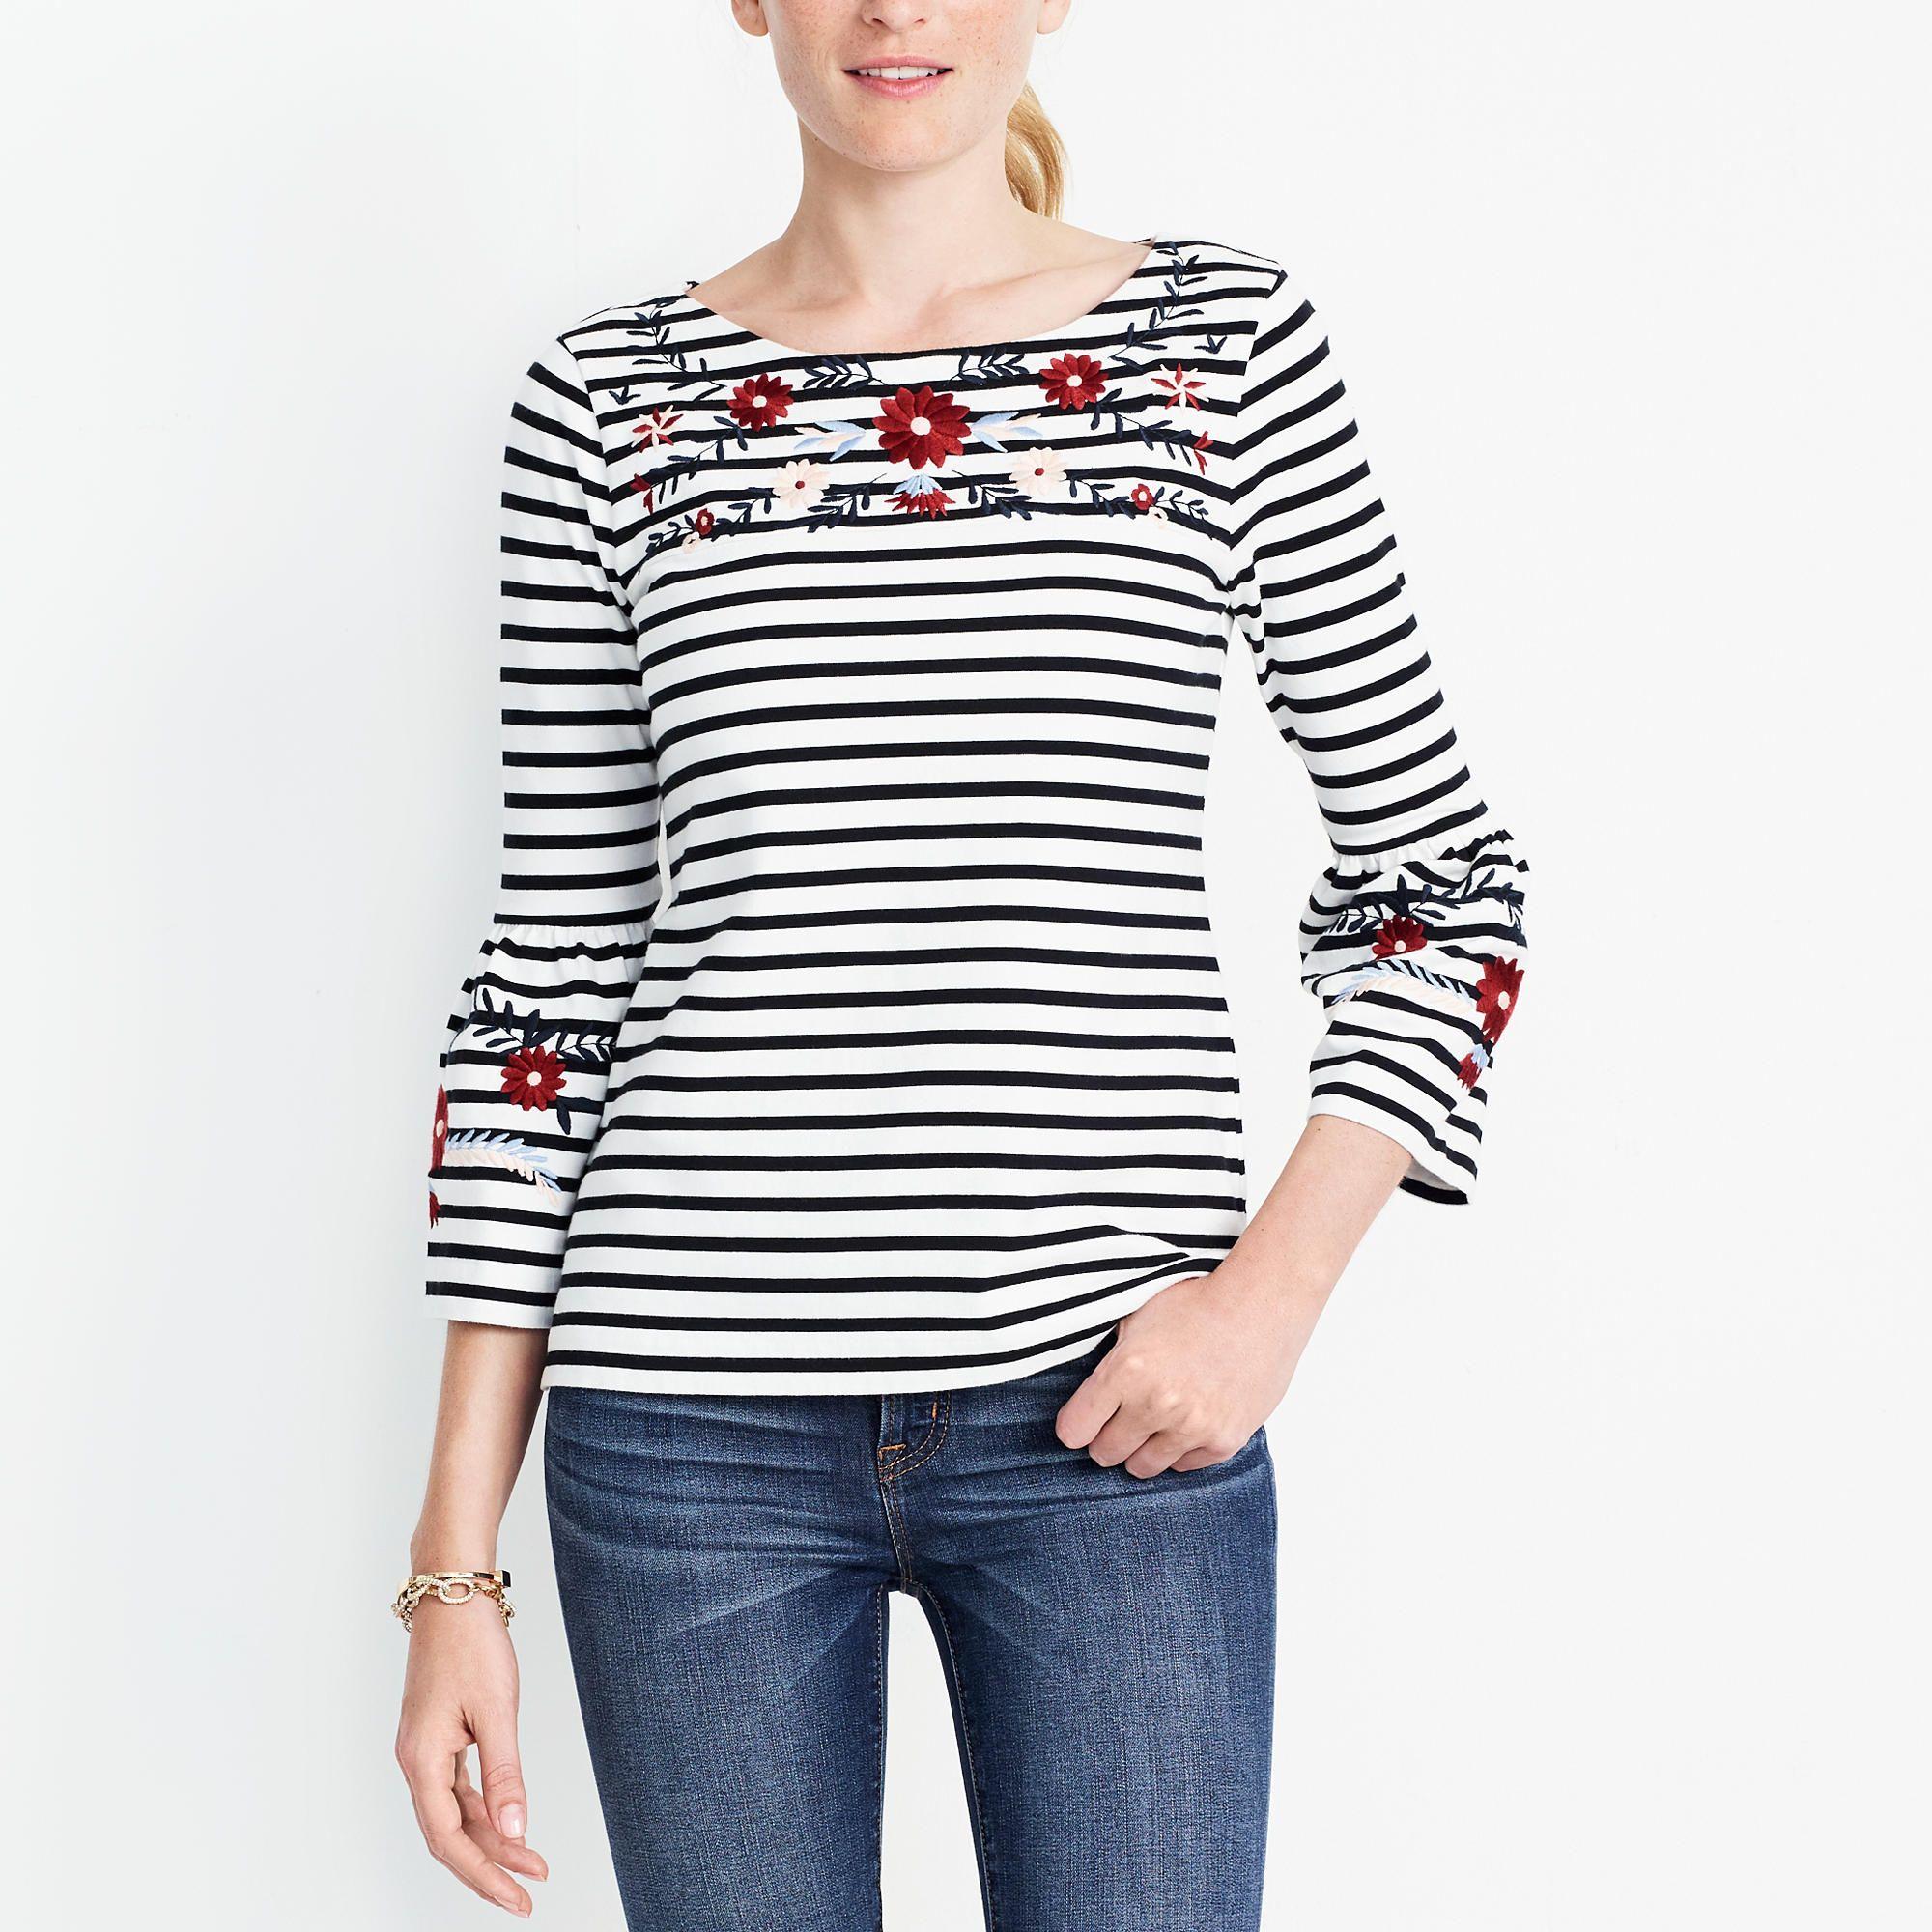 Embroidered striped bellsleeve tshirt fashion womens